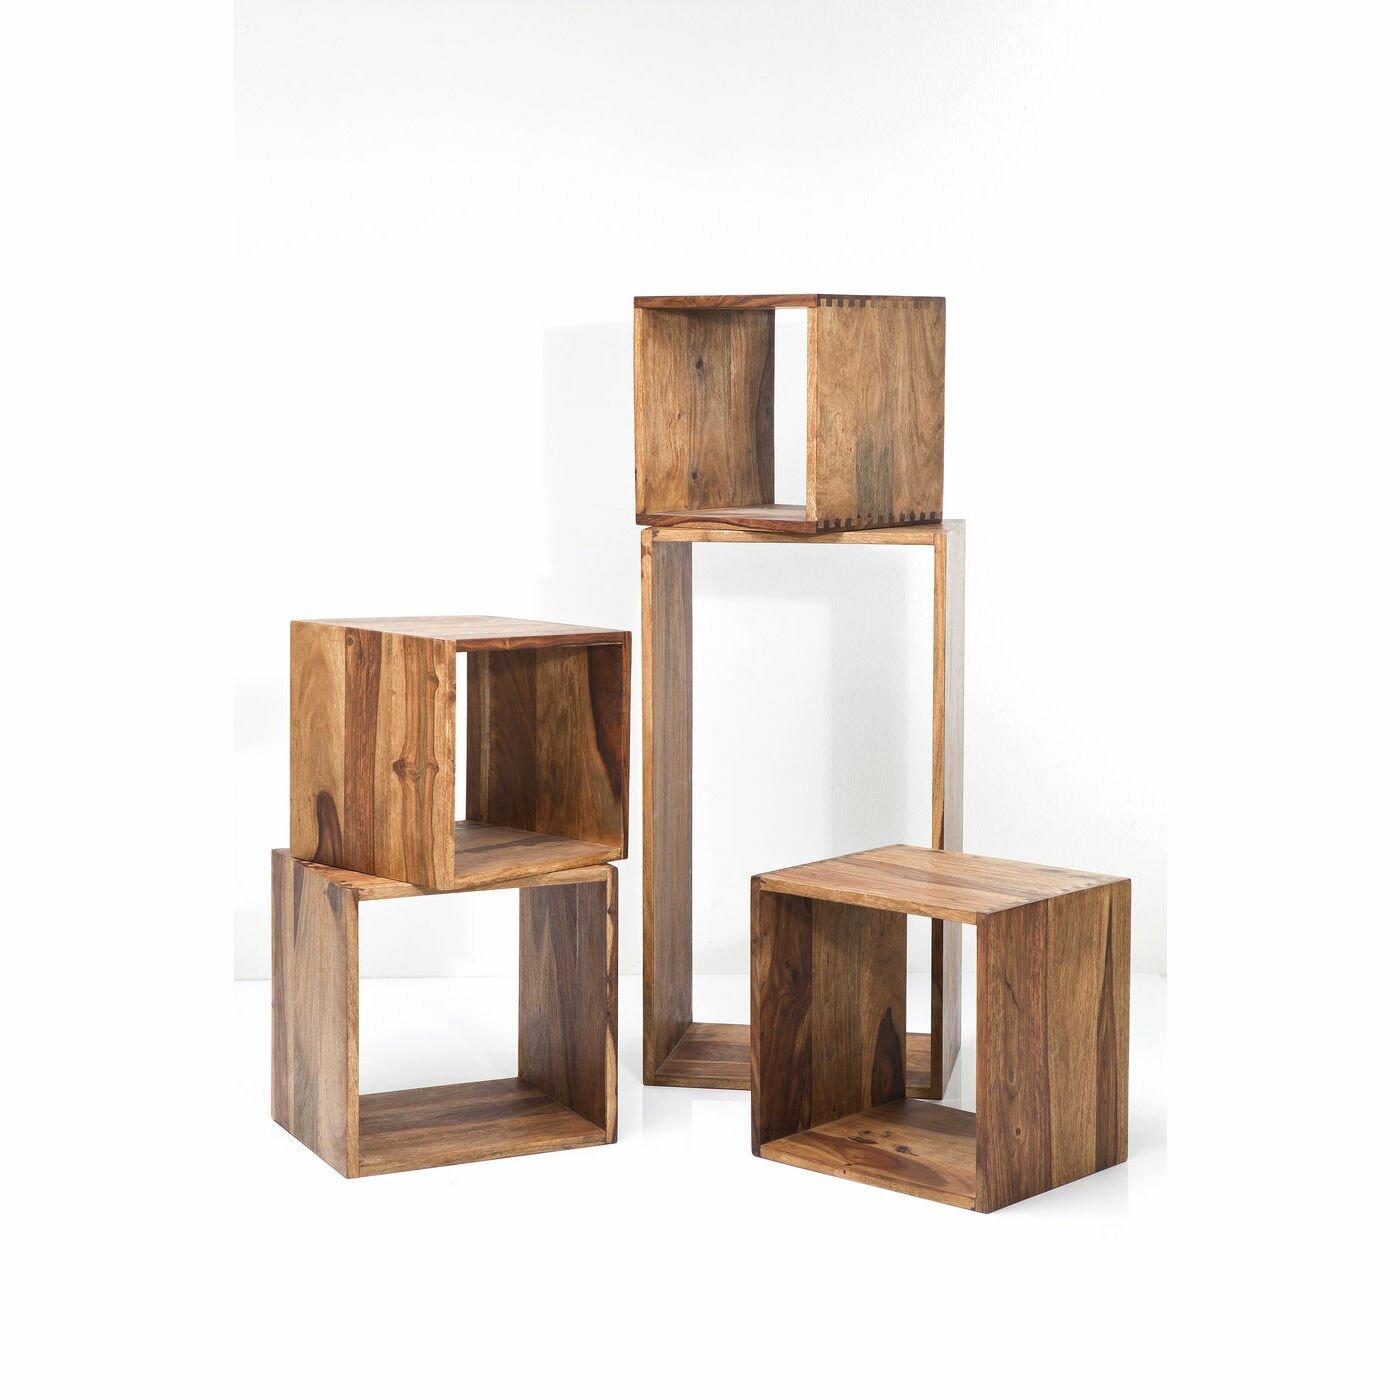 kare design authentico 5 piece cube set wayfair uk. Black Bedroom Furniture Sets. Home Design Ideas